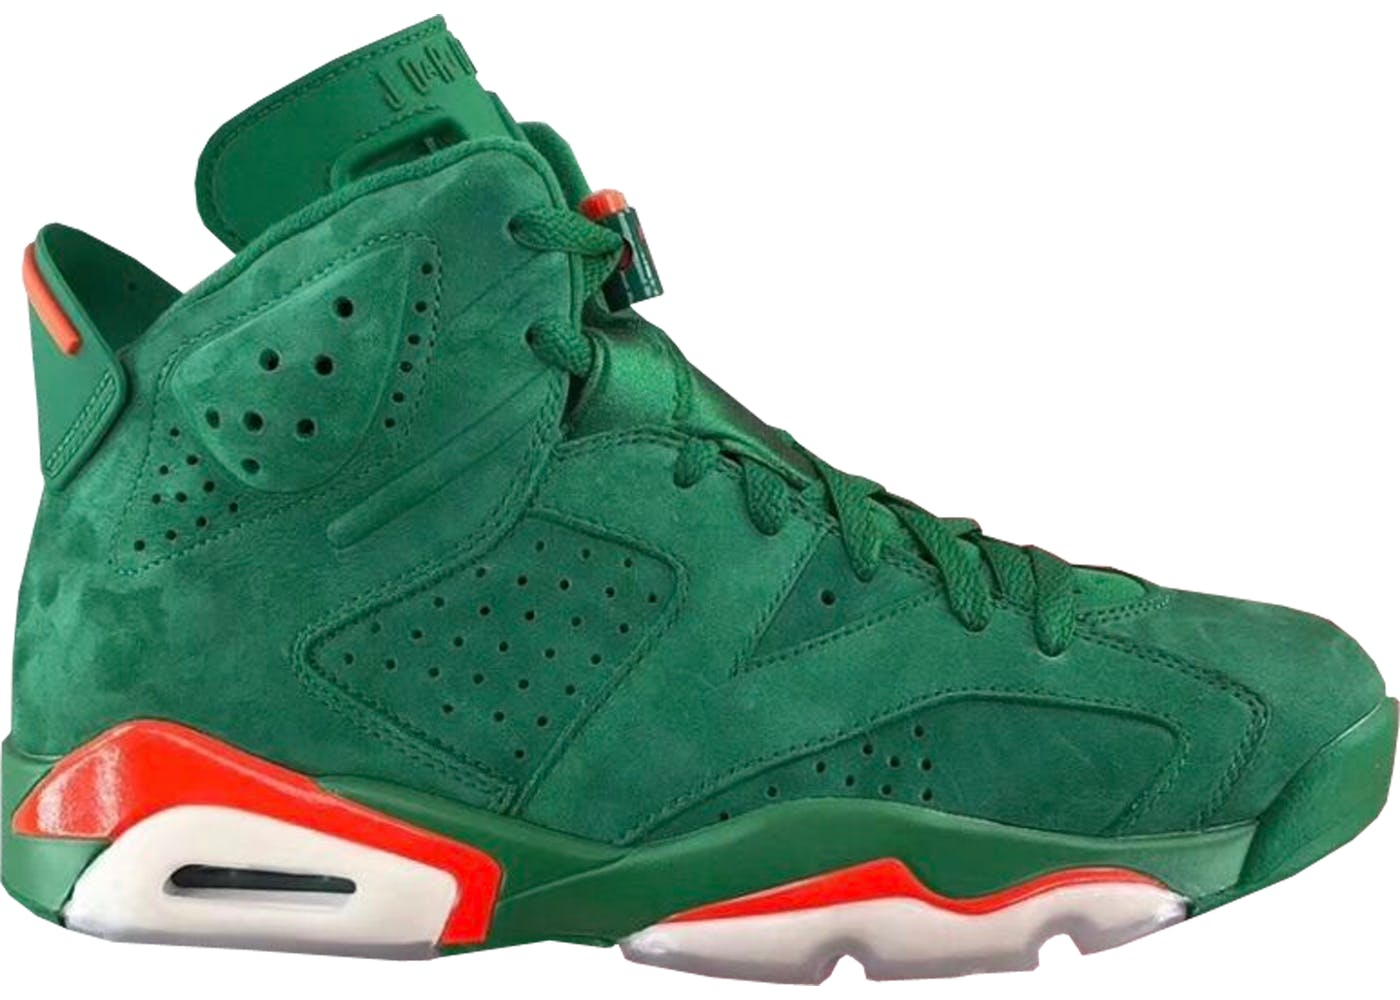 Jordans Shoes For Free